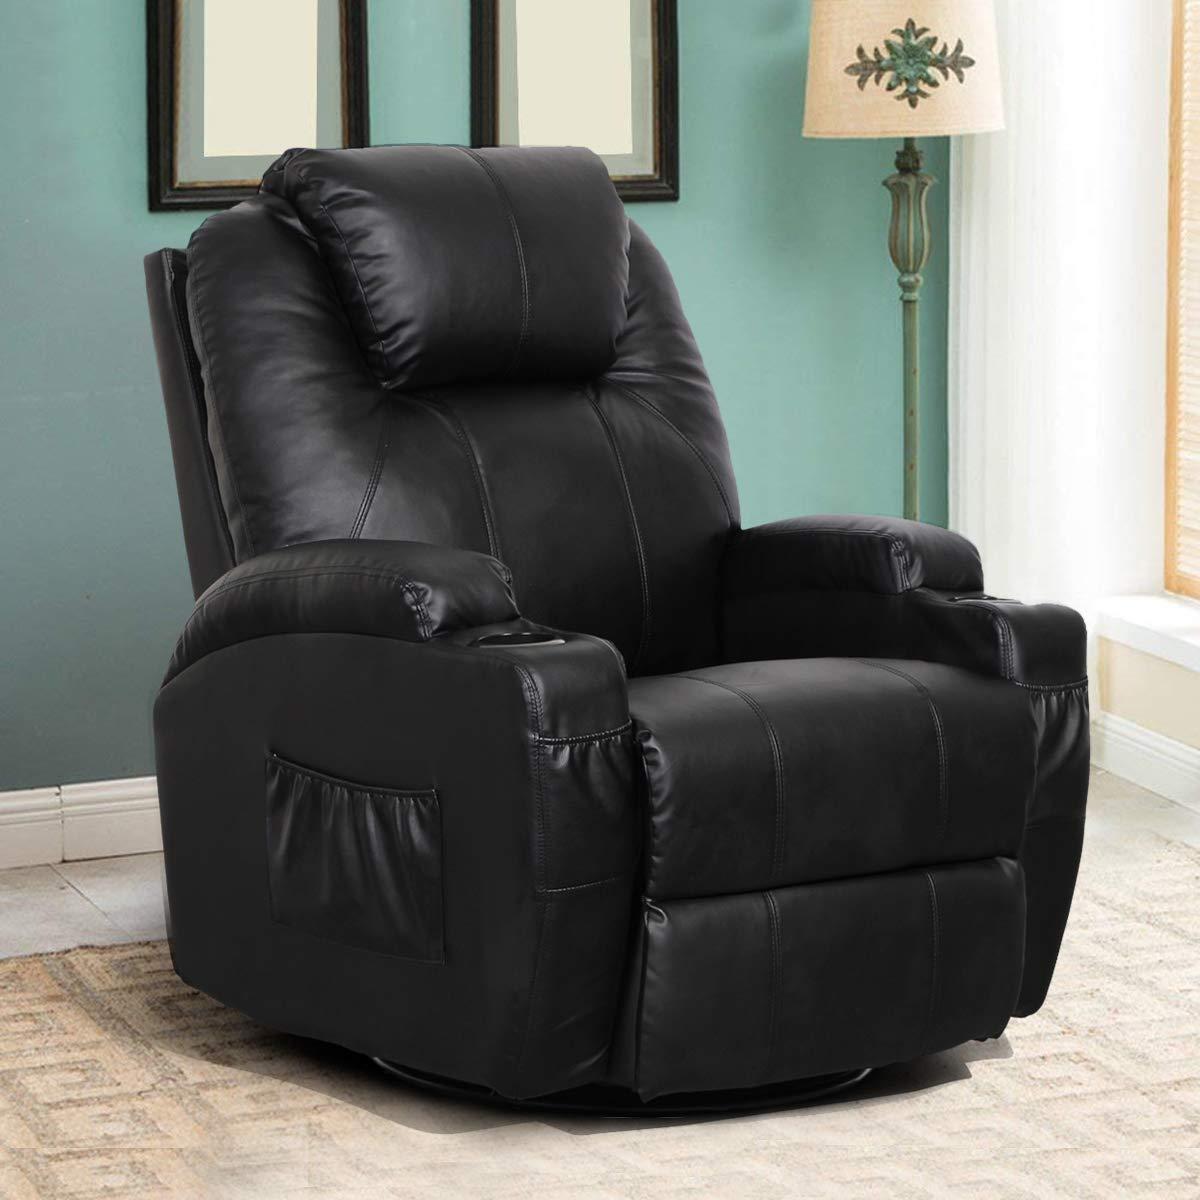 Esright Massage Recliner PU Leather Ergonomic Lounge Heated Chair 360 Degree Swivel Recliner (Black) by Esright